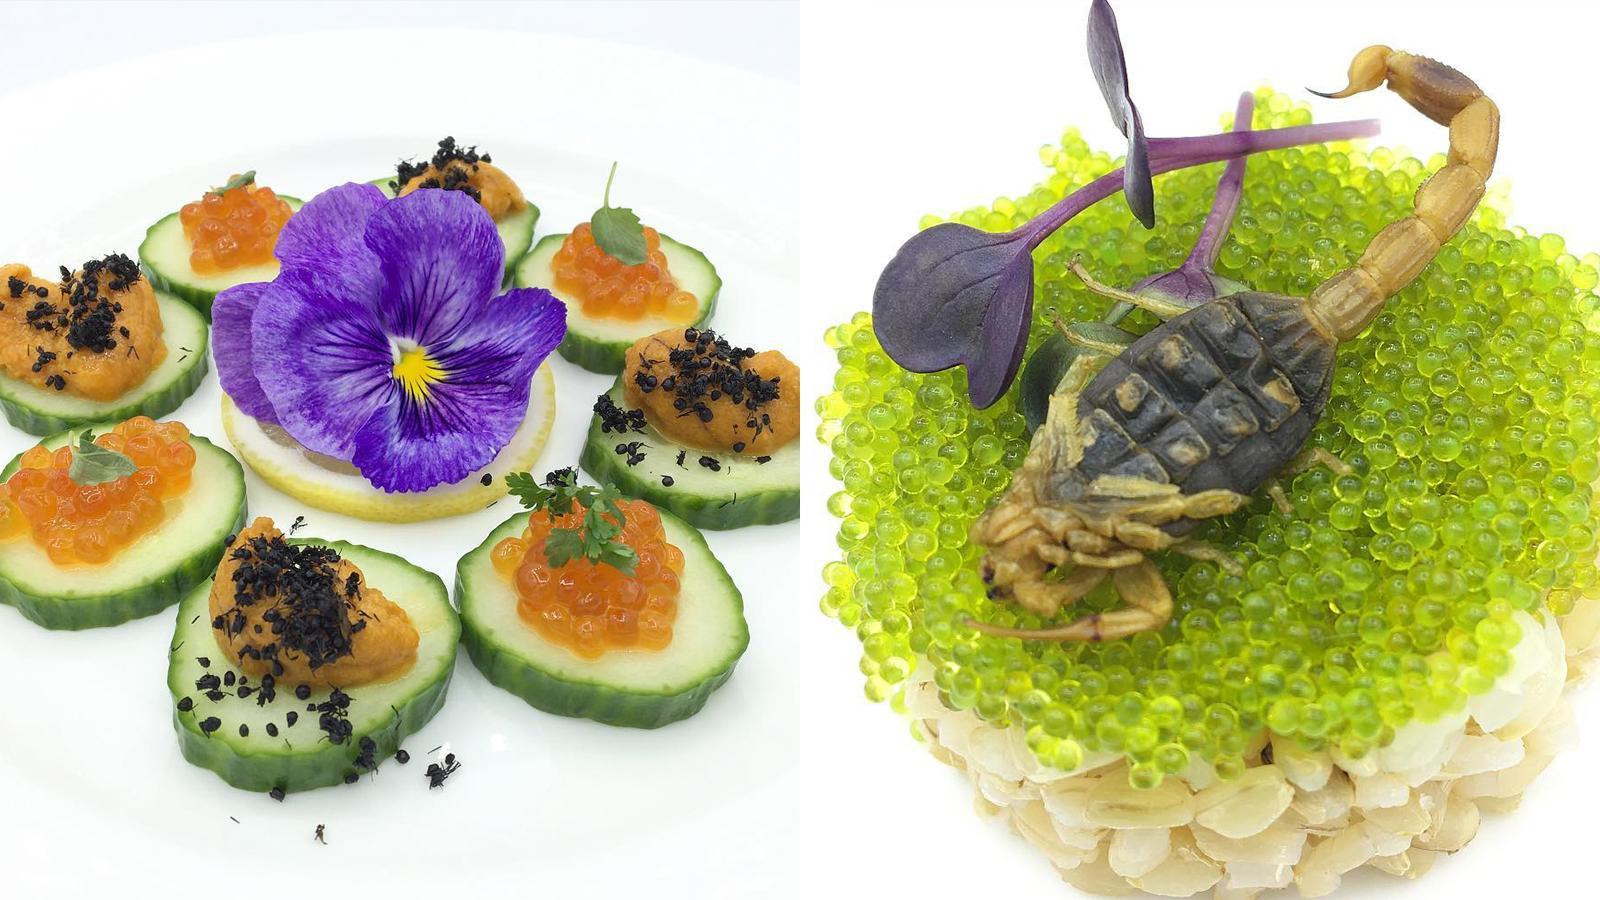 Restoran Di As Sajikan Makanan Mewah Dengan Topping Serangga Kurio